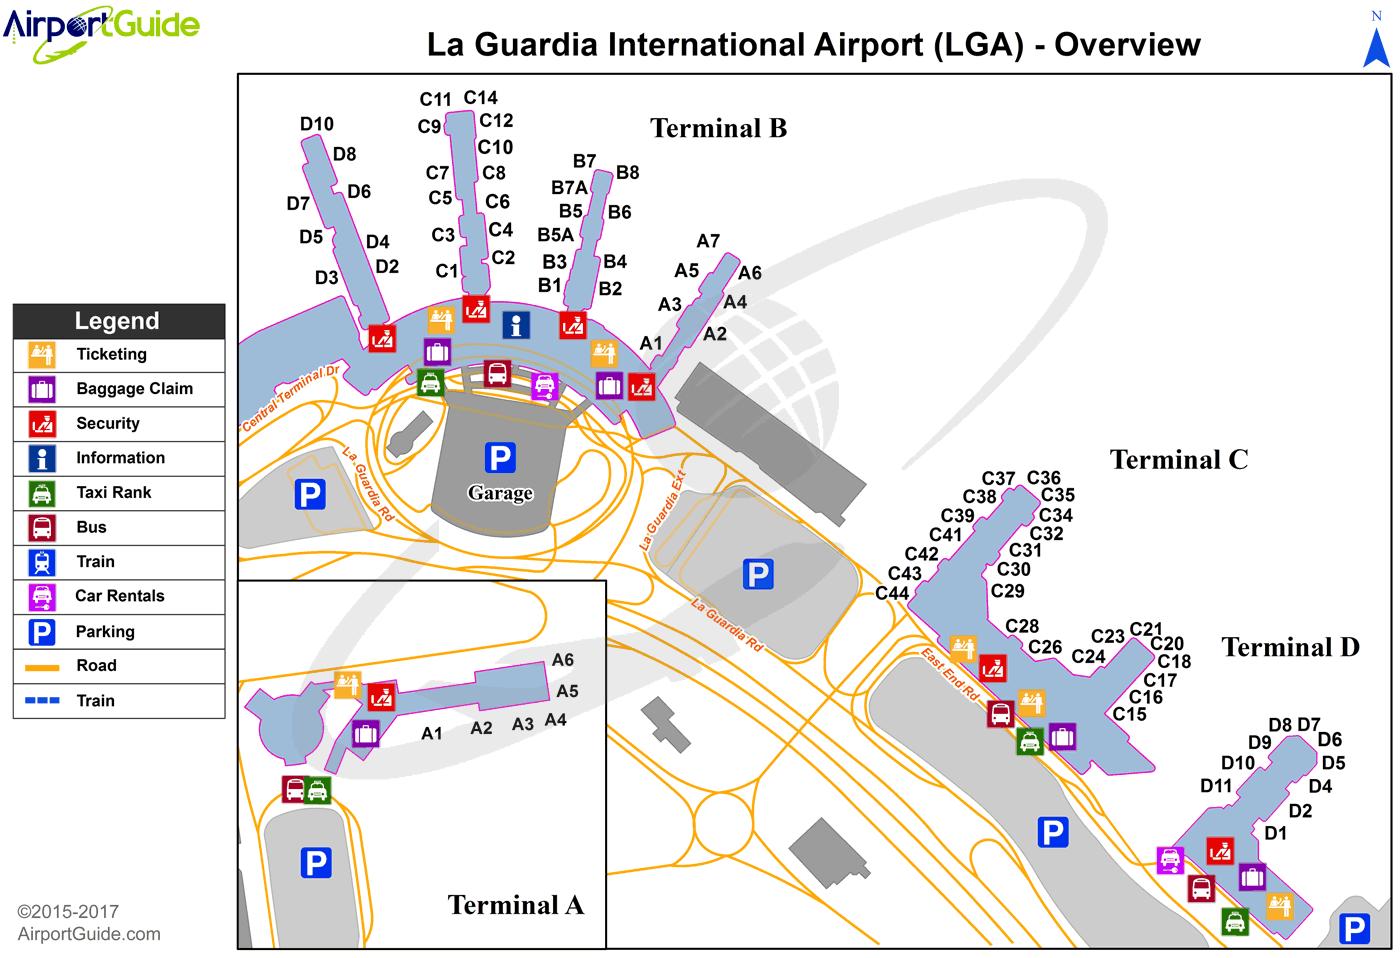 detroit  detroit metropolitan wayne county (dtw) airport terminal map overview  airport terminal maps  airportguidecom  pinterest  detroit. detroit  detroit metropolitan wayne county (dtw) airport terminal